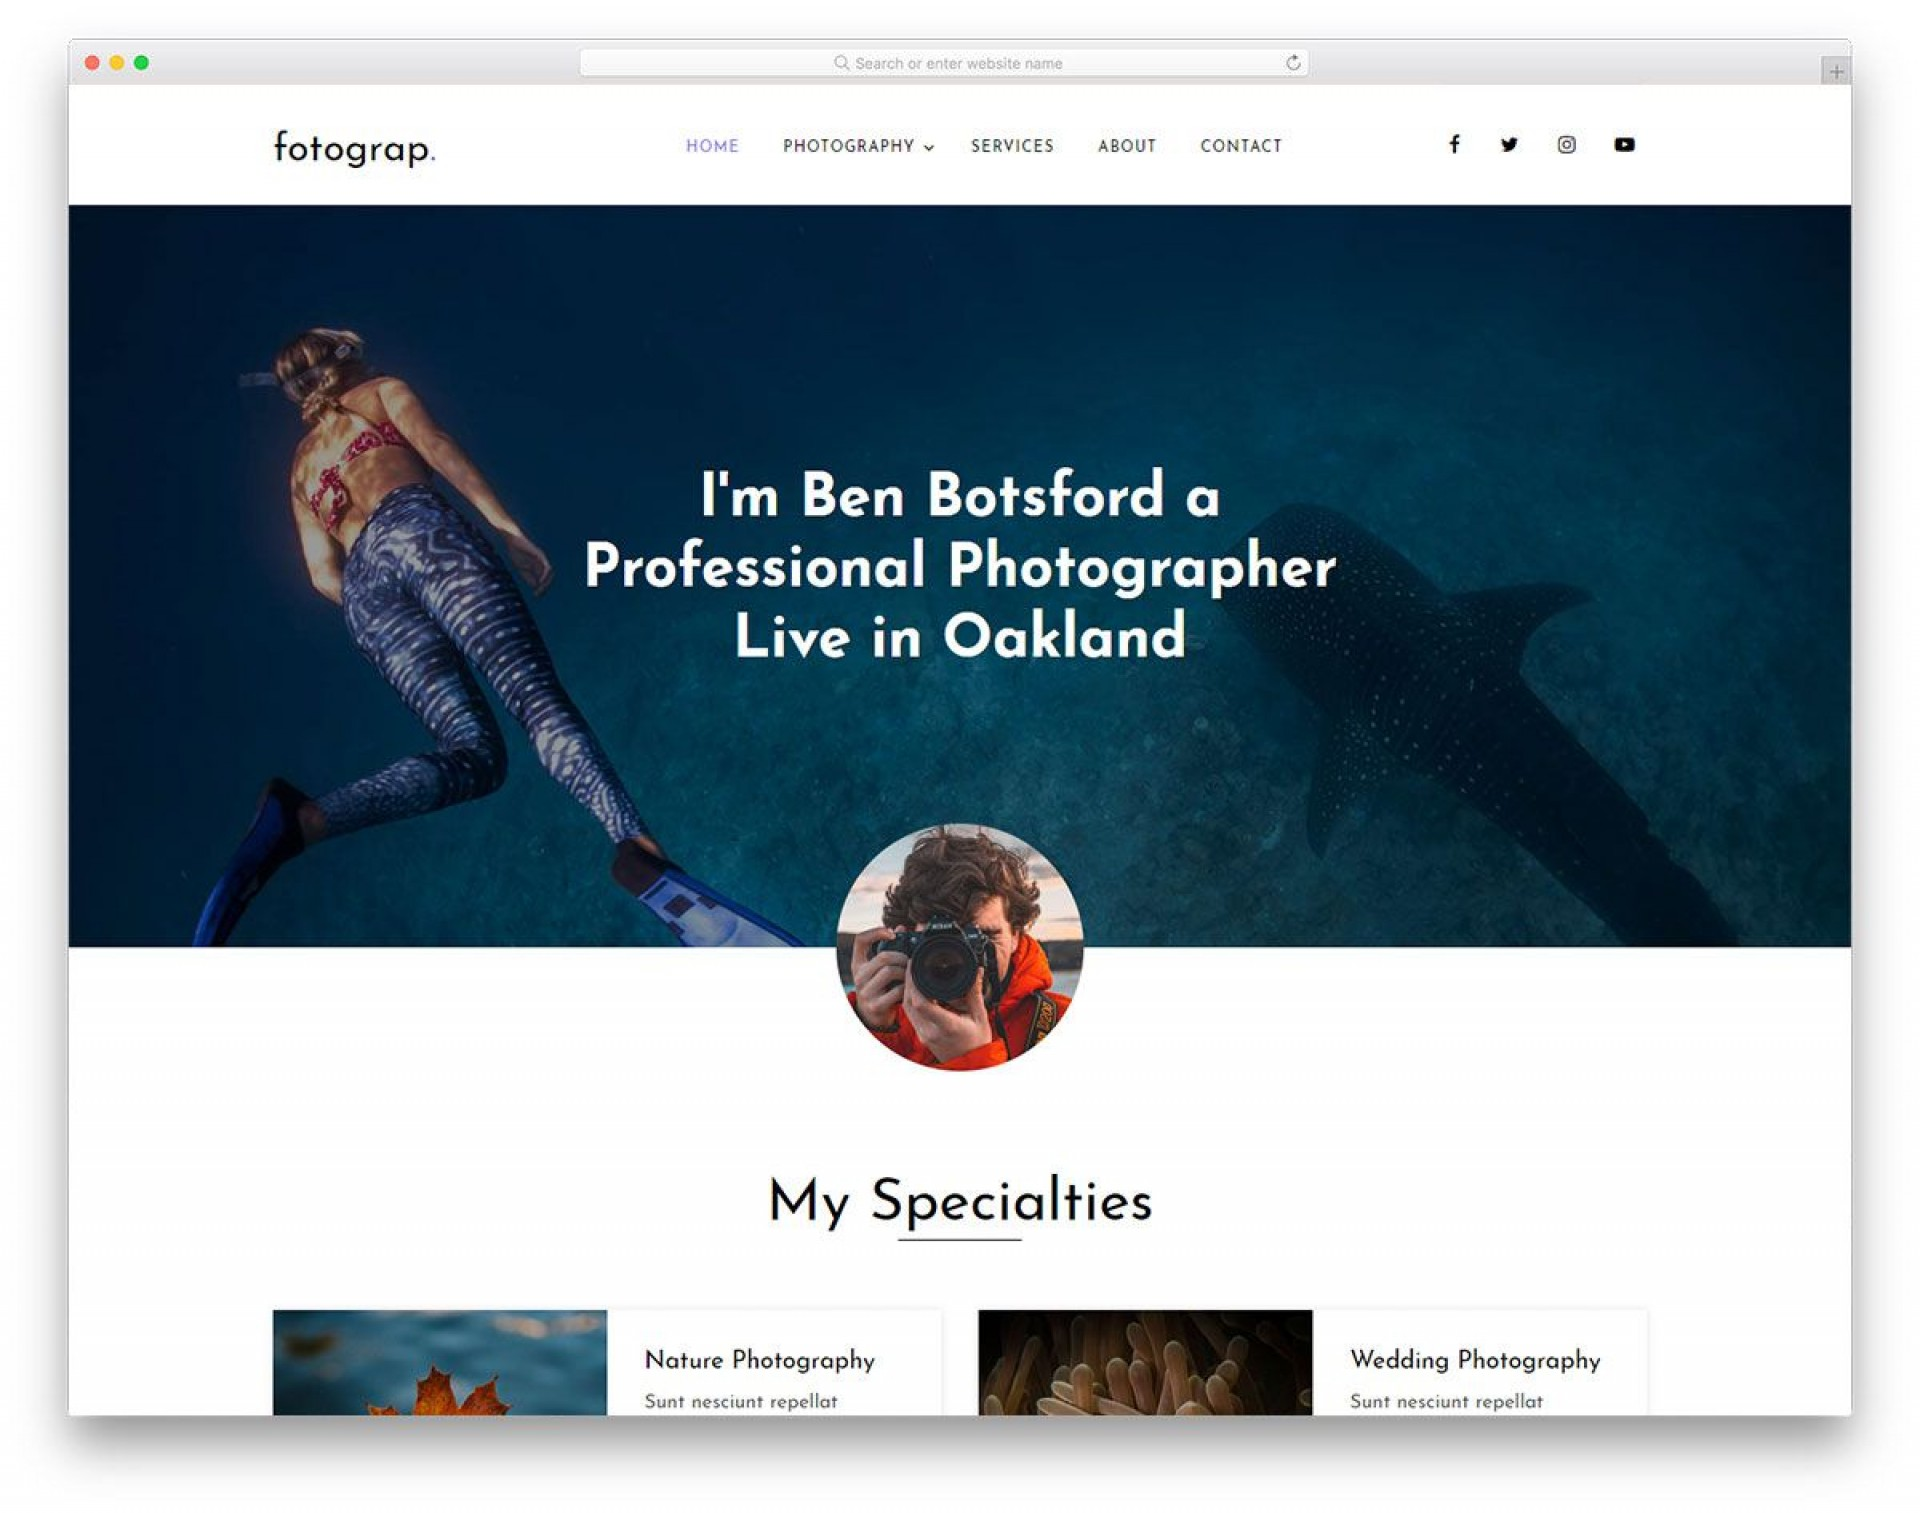 004 Sensational Website Template For Photographer High Def  Photographers Free Responsive Photography Php Best1920